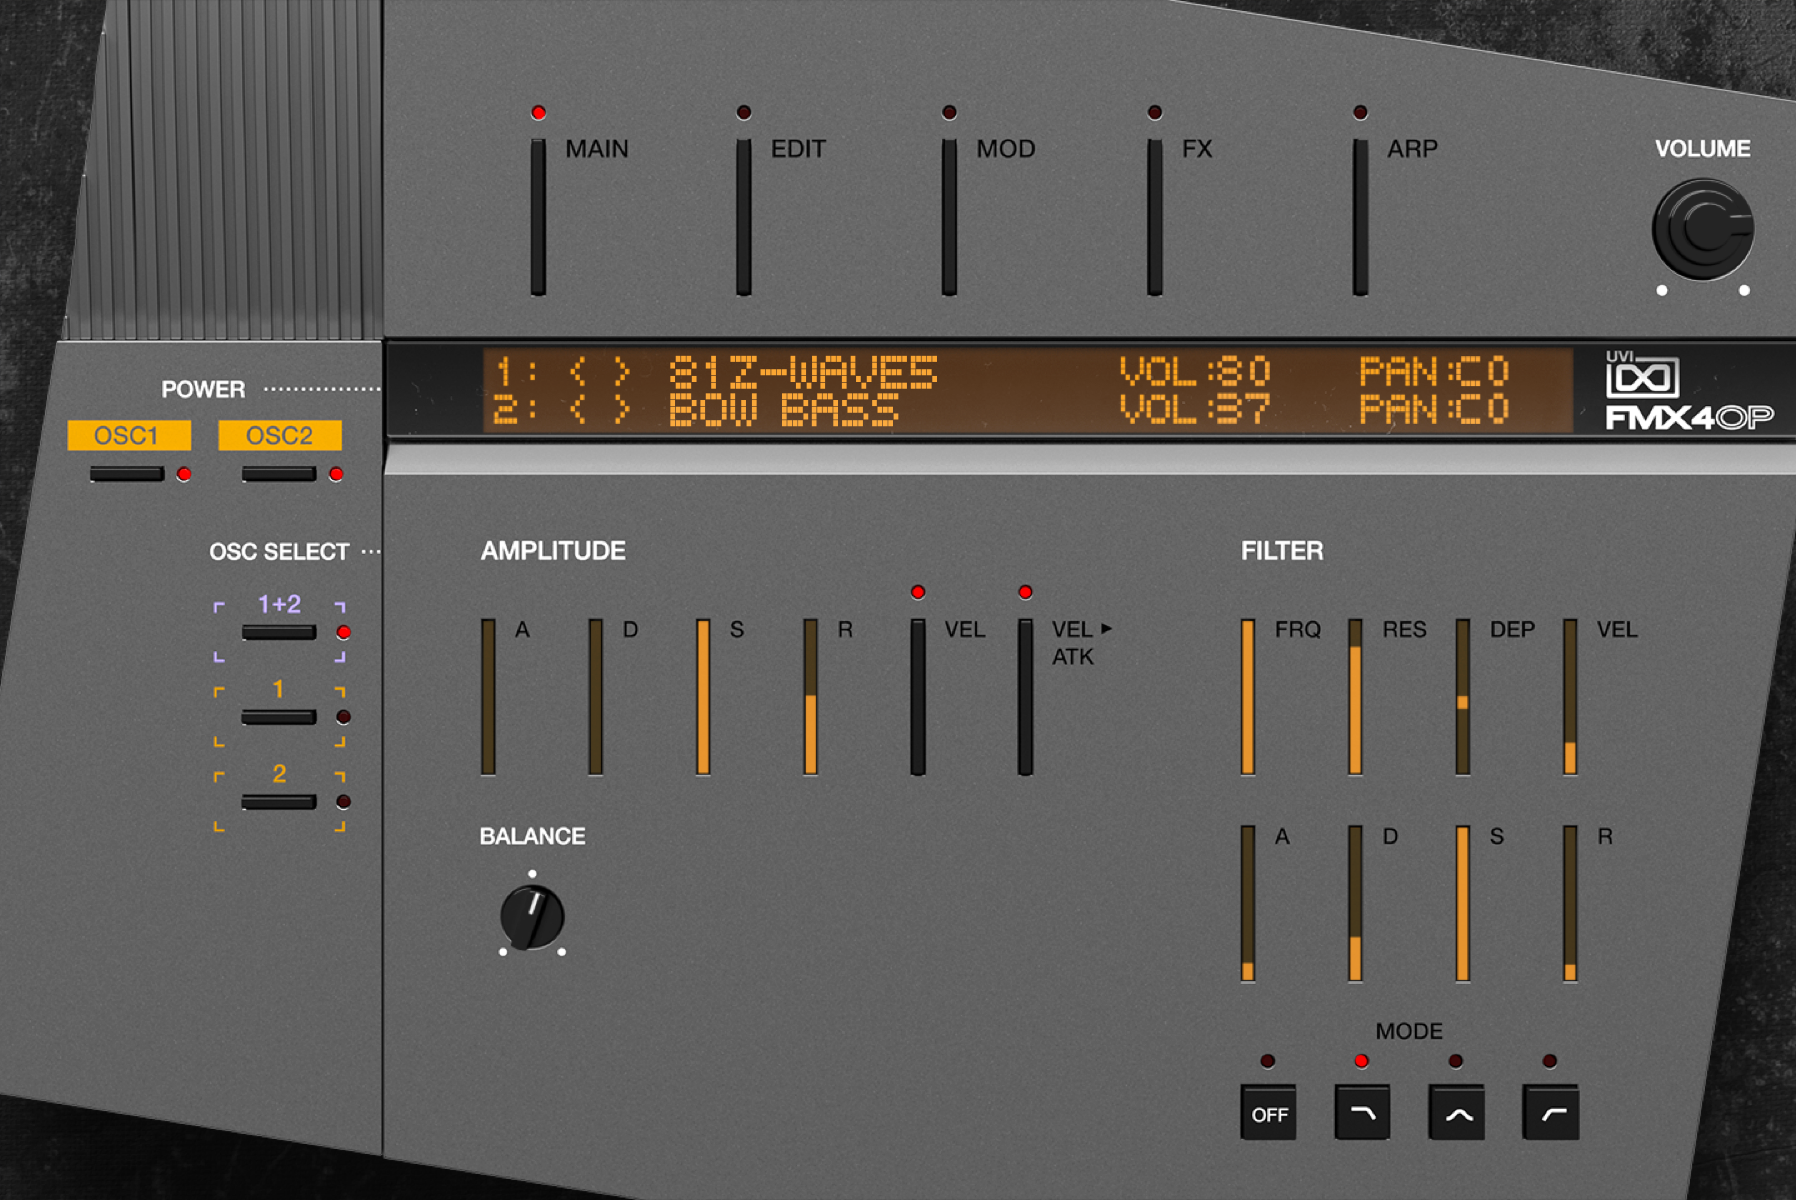 FMX-4op MAIN GUI